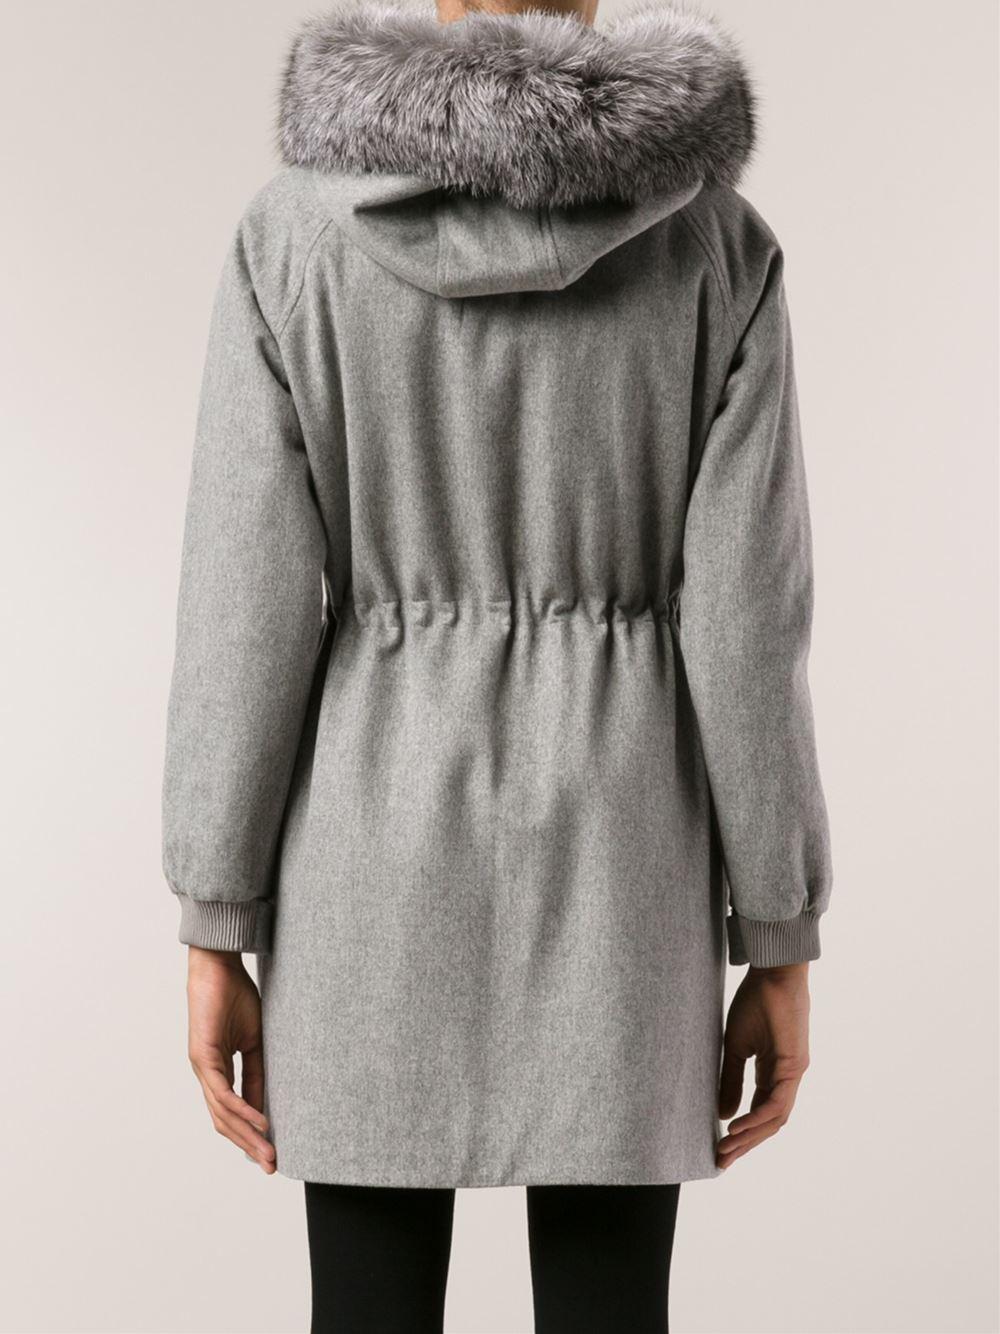 Loro piana Fur Hood Trim Coat in Gray | Lyst